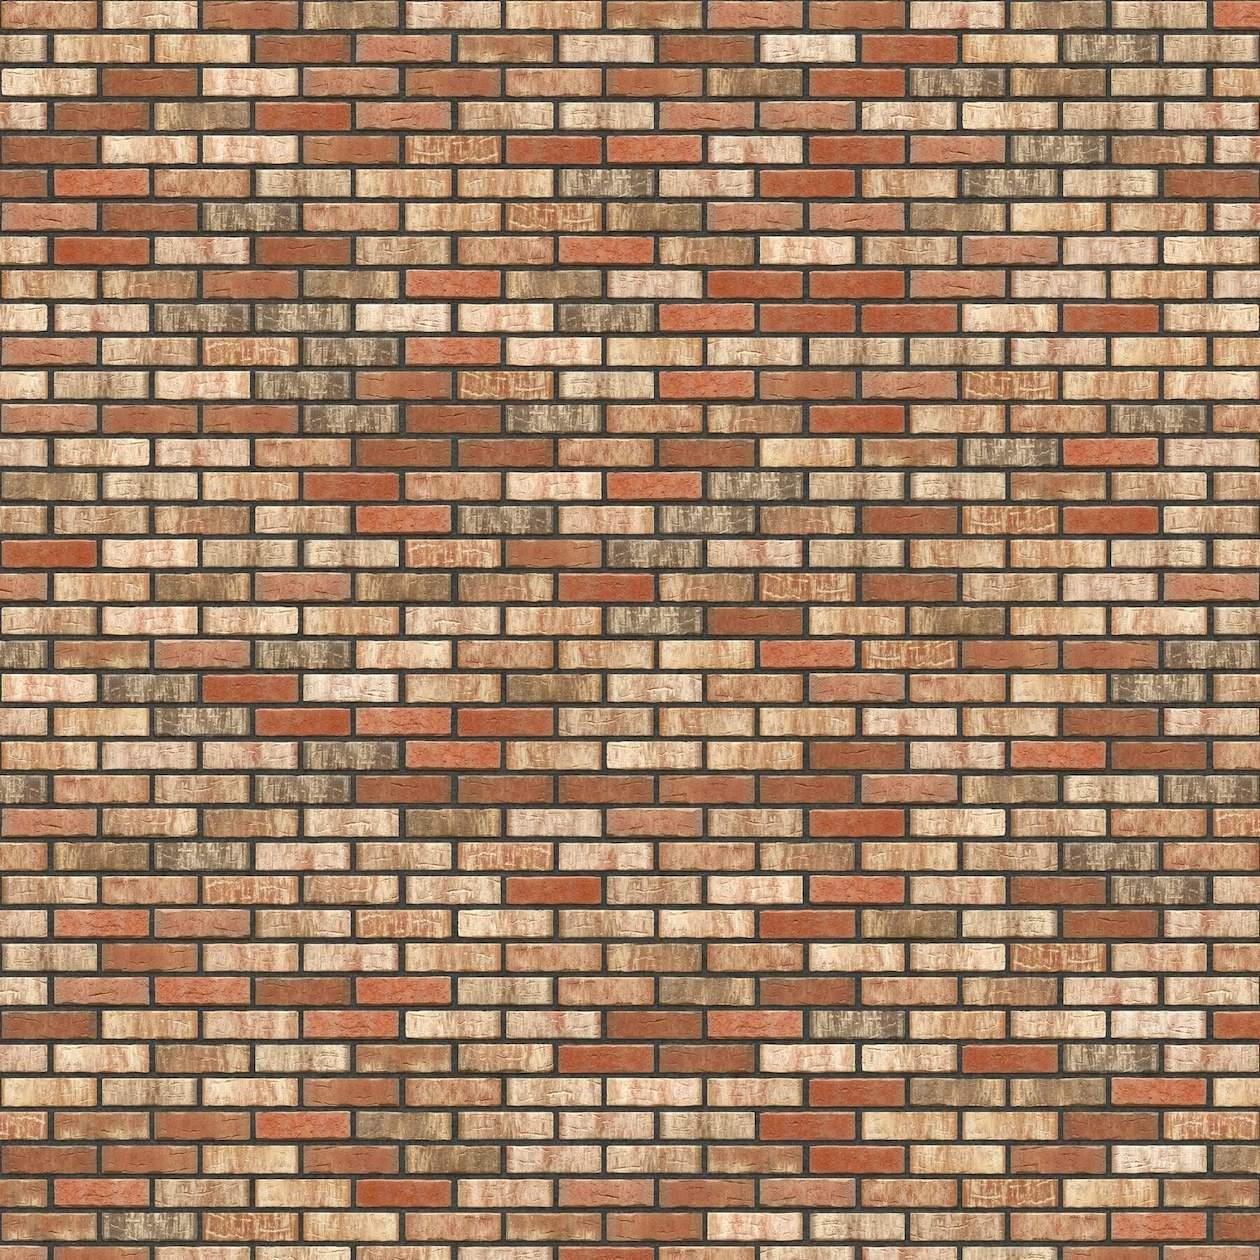 Puna-cigla-FeldHaus-Klinker-brick-house-nf-k-690-Antracit Fuga